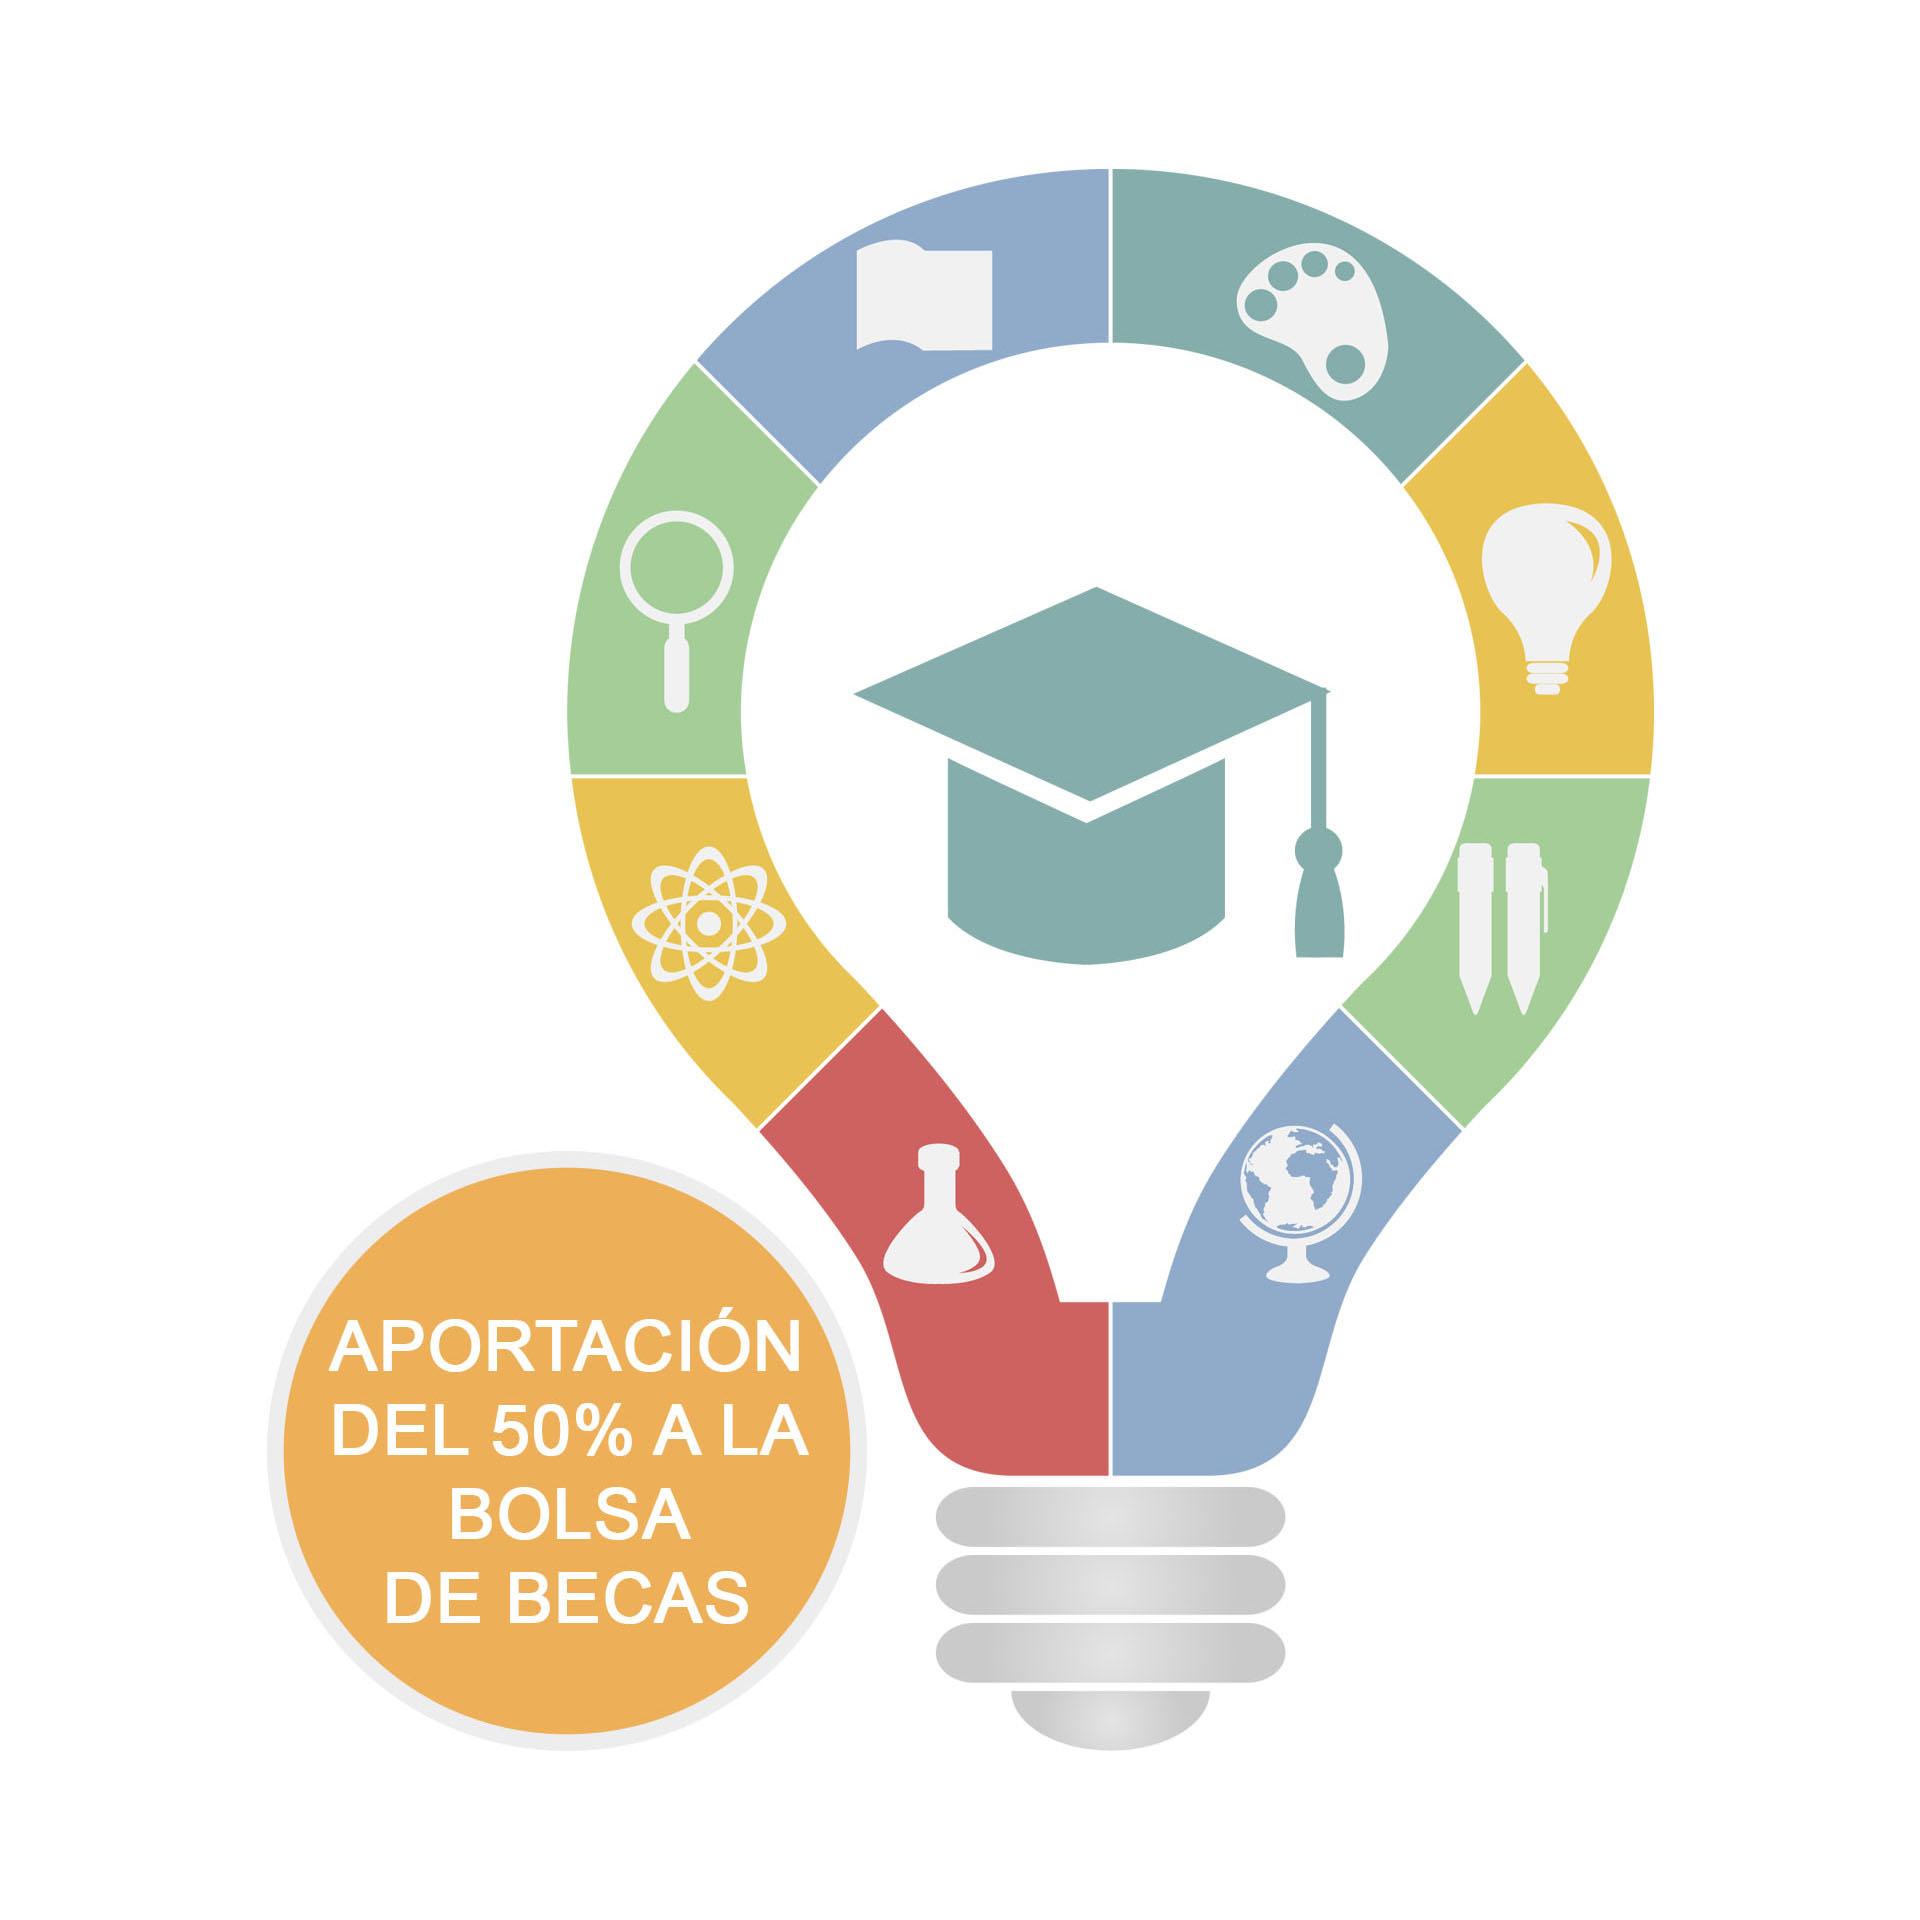 Centro educativo con consultoría energética de Ka Educa